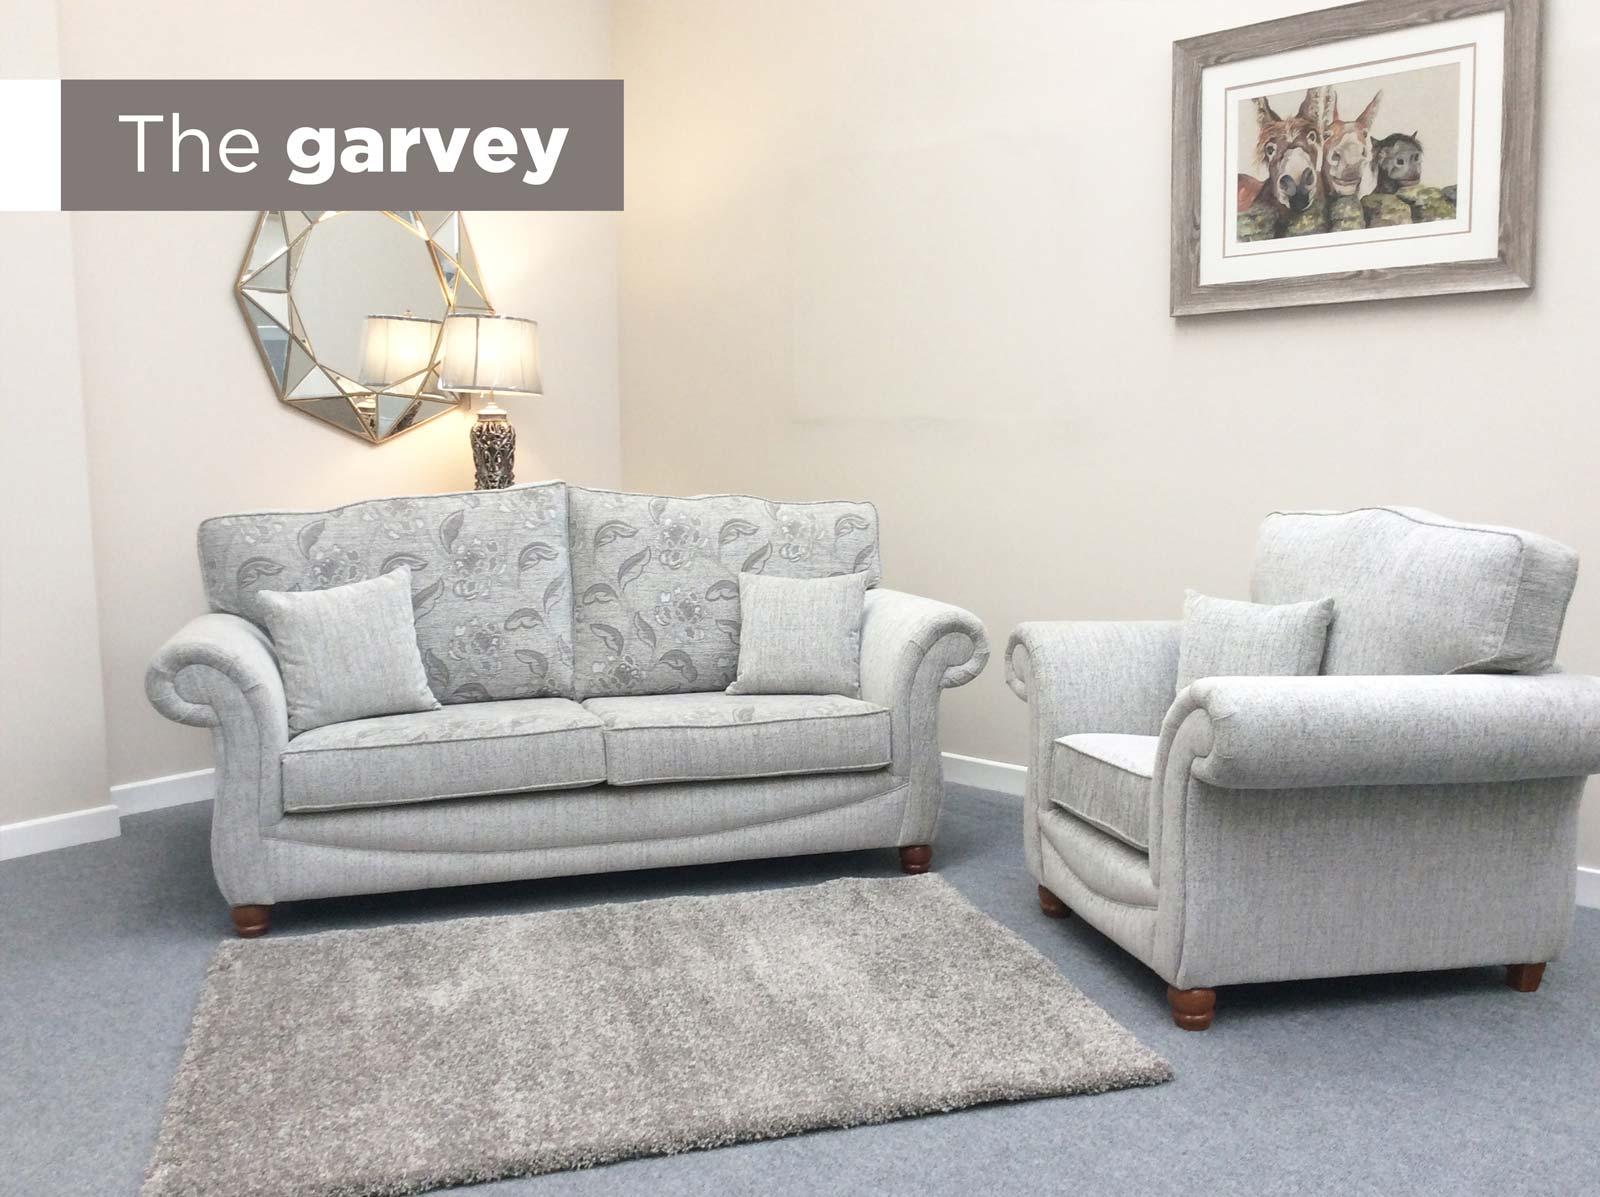 GAR8  Garvey Sofa Range  Living Room Furniture  furniture